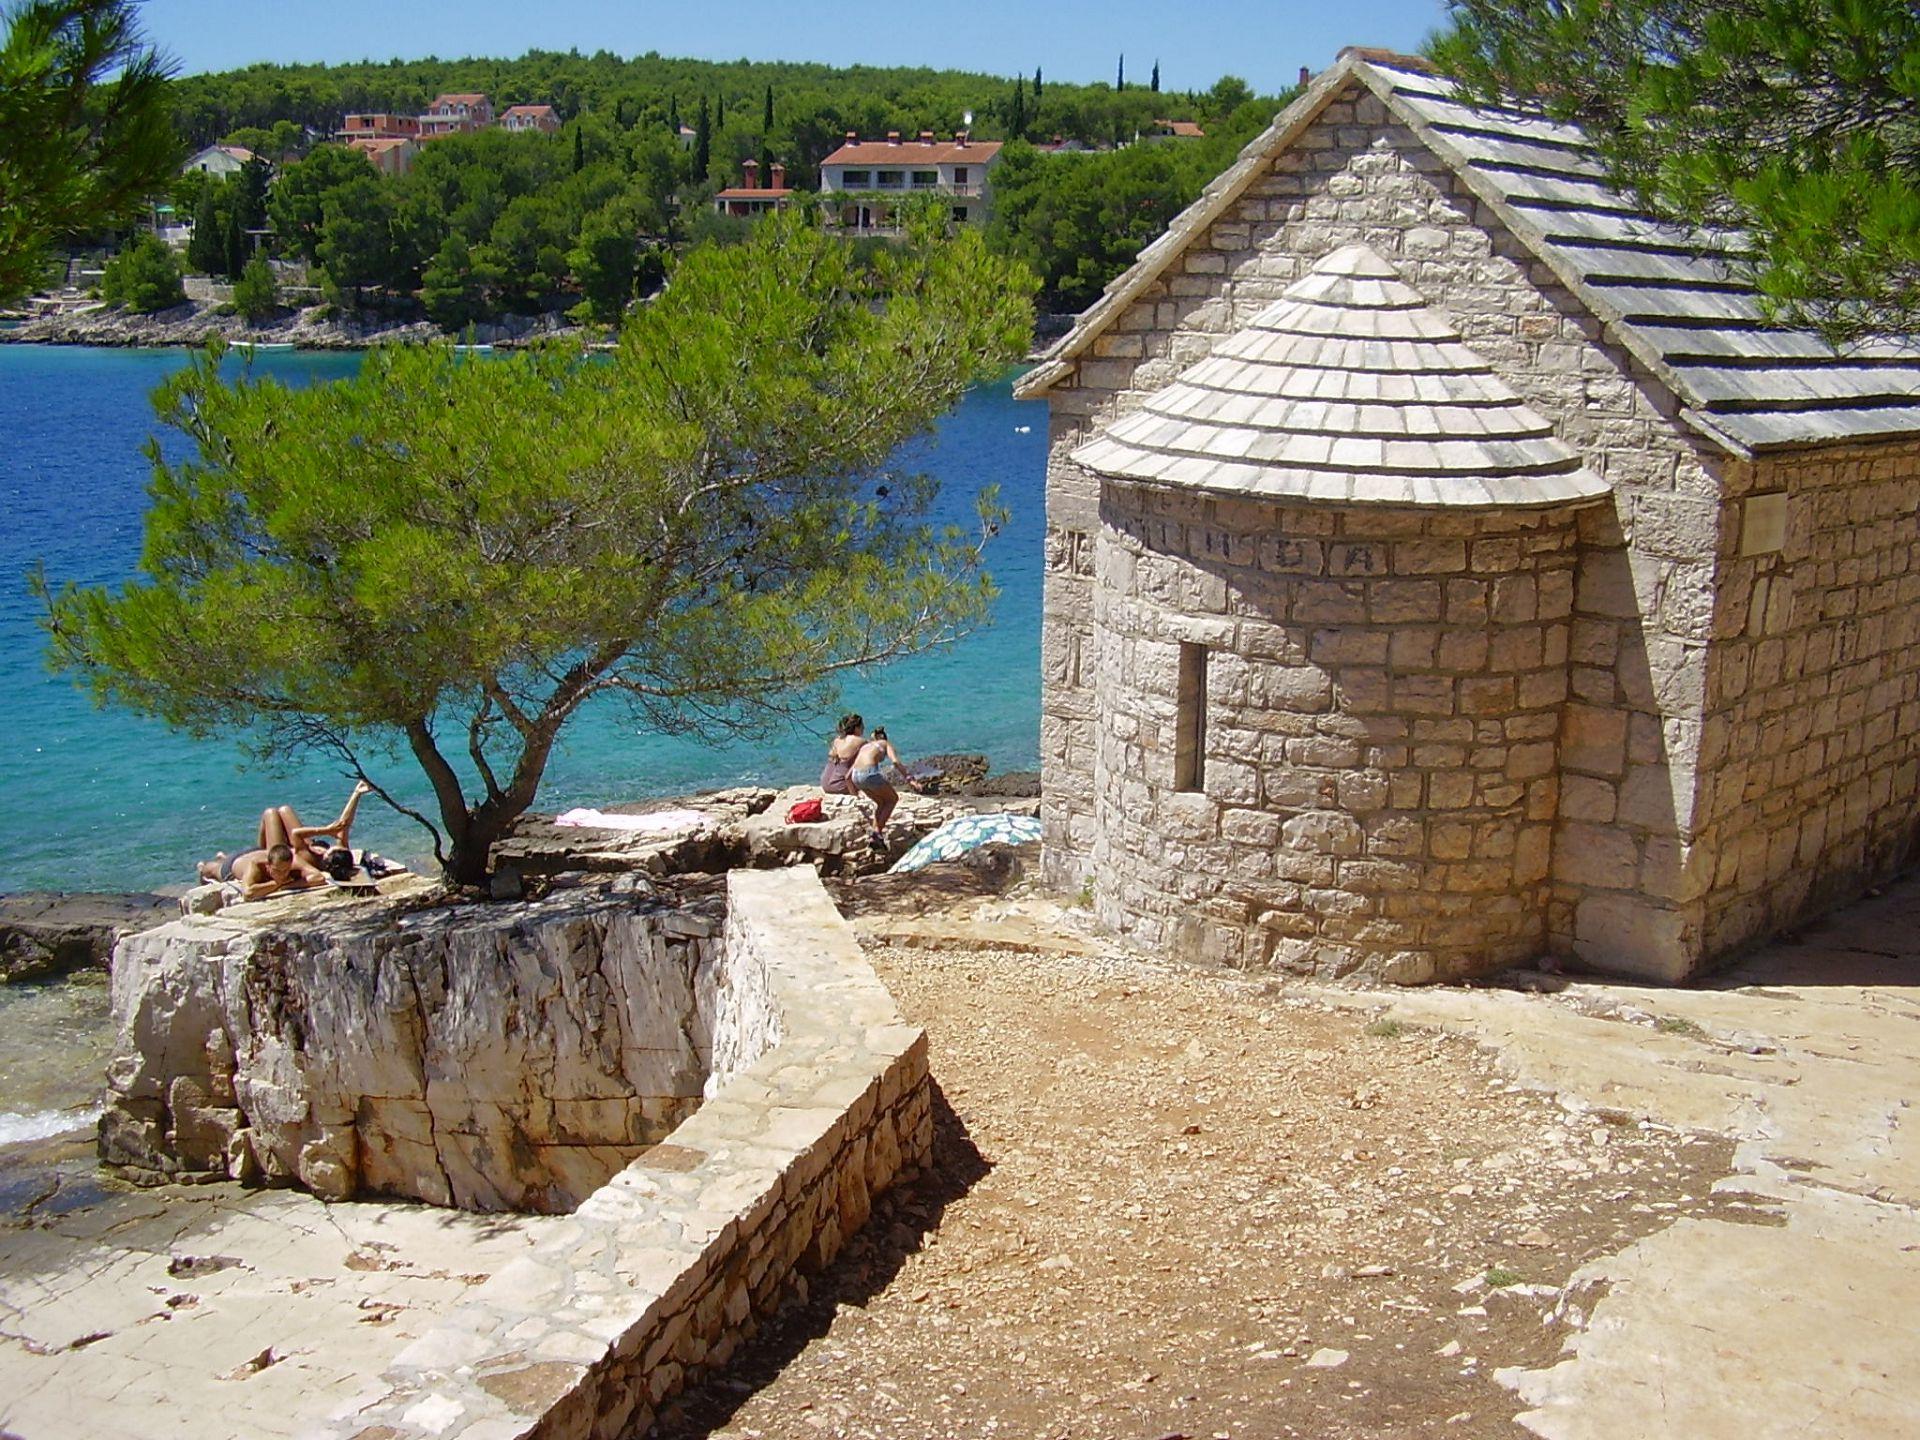 Denis - Baai Osibova (Milna) - Vakantiehuizen, villa´s Kroatië - strand